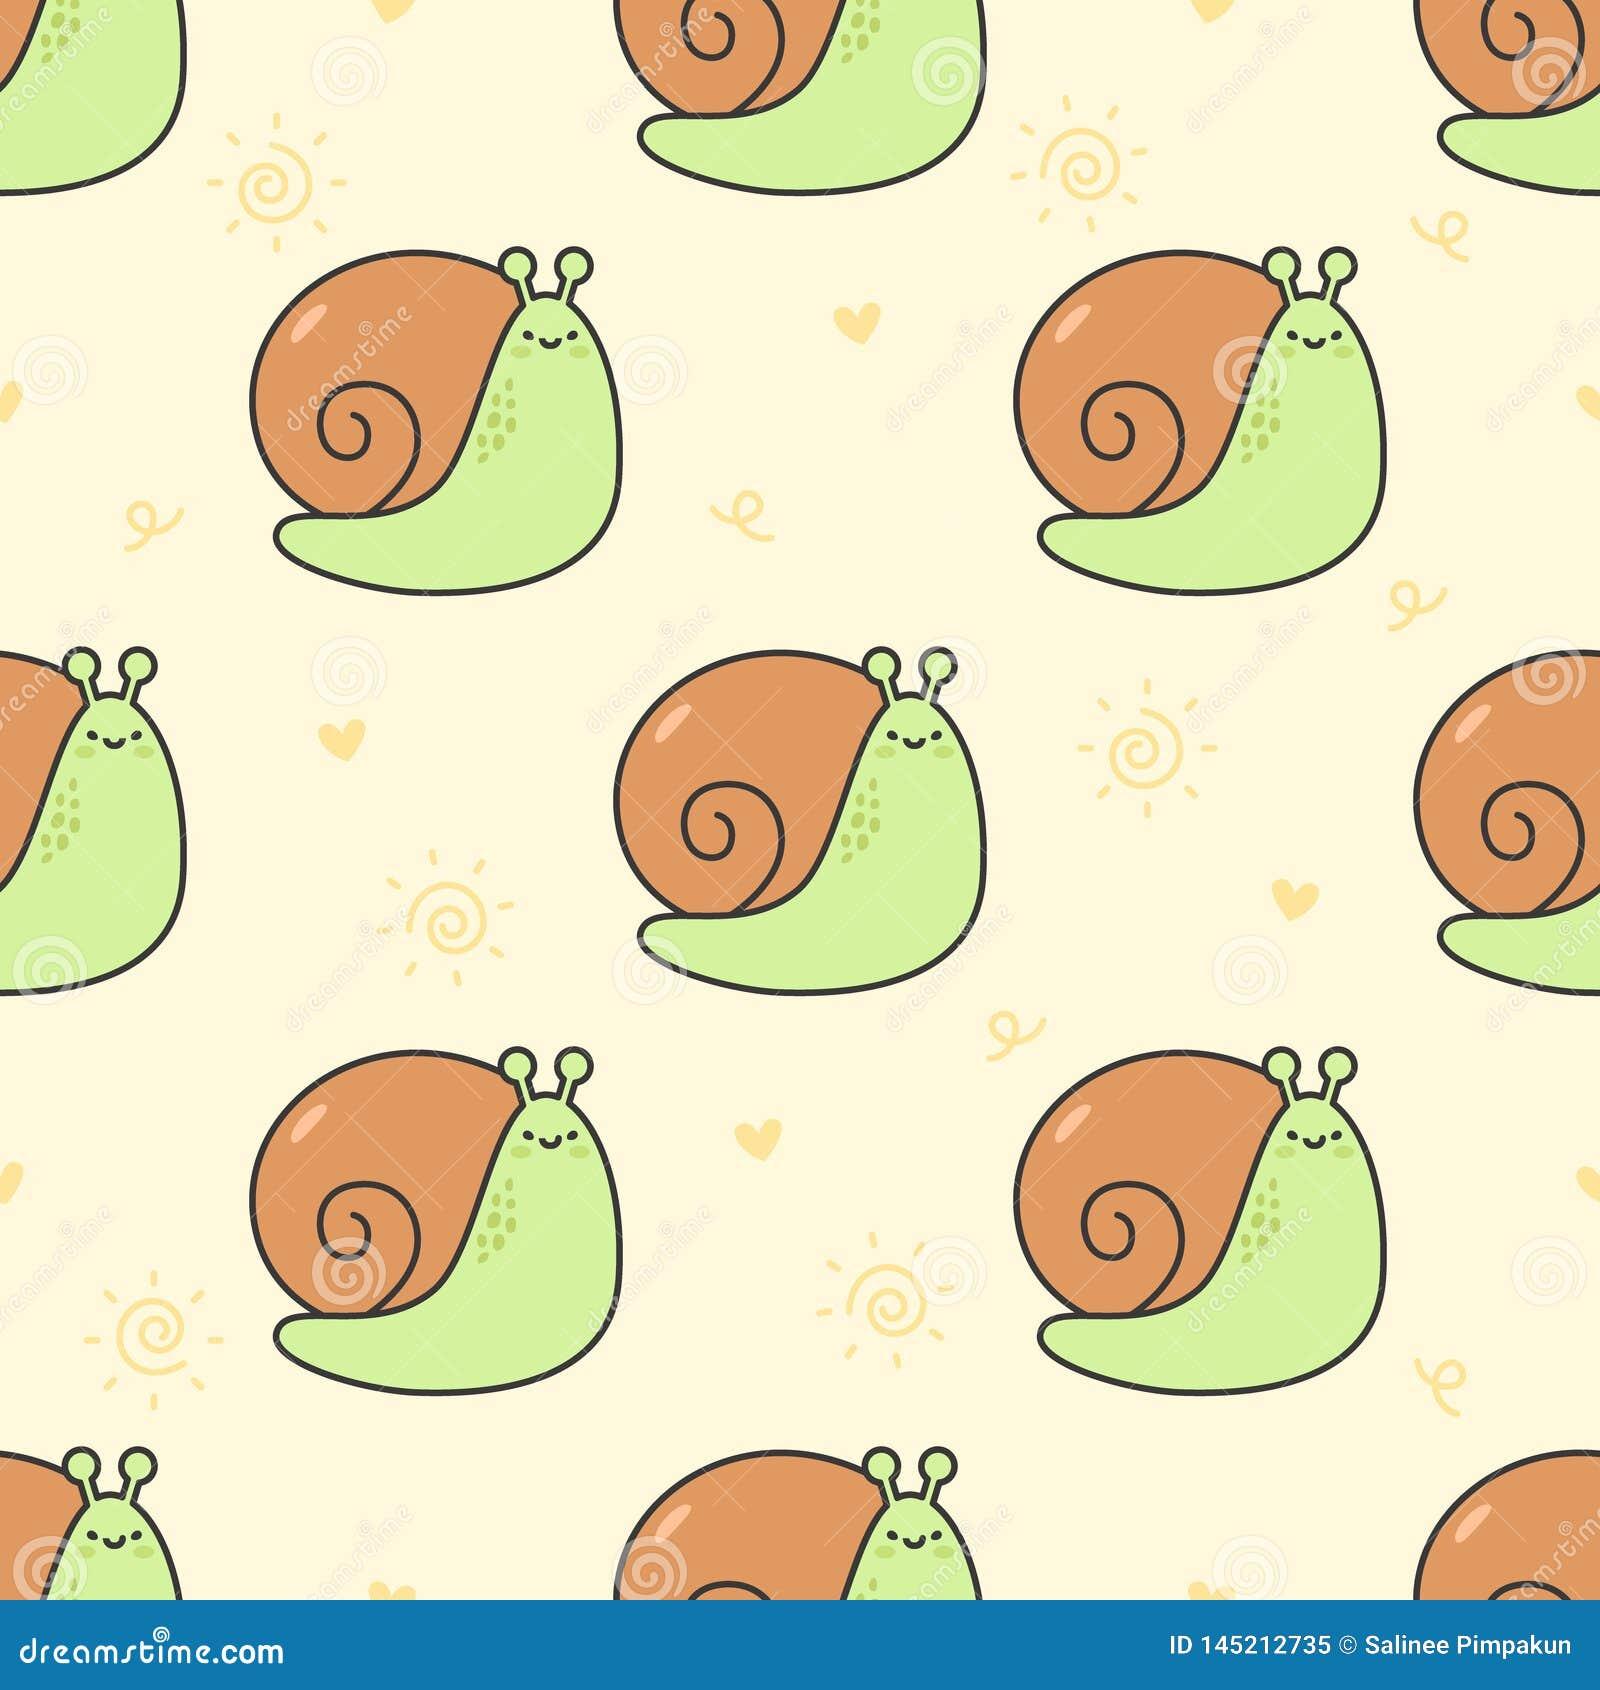 Cute snail Seamless Pattern Background